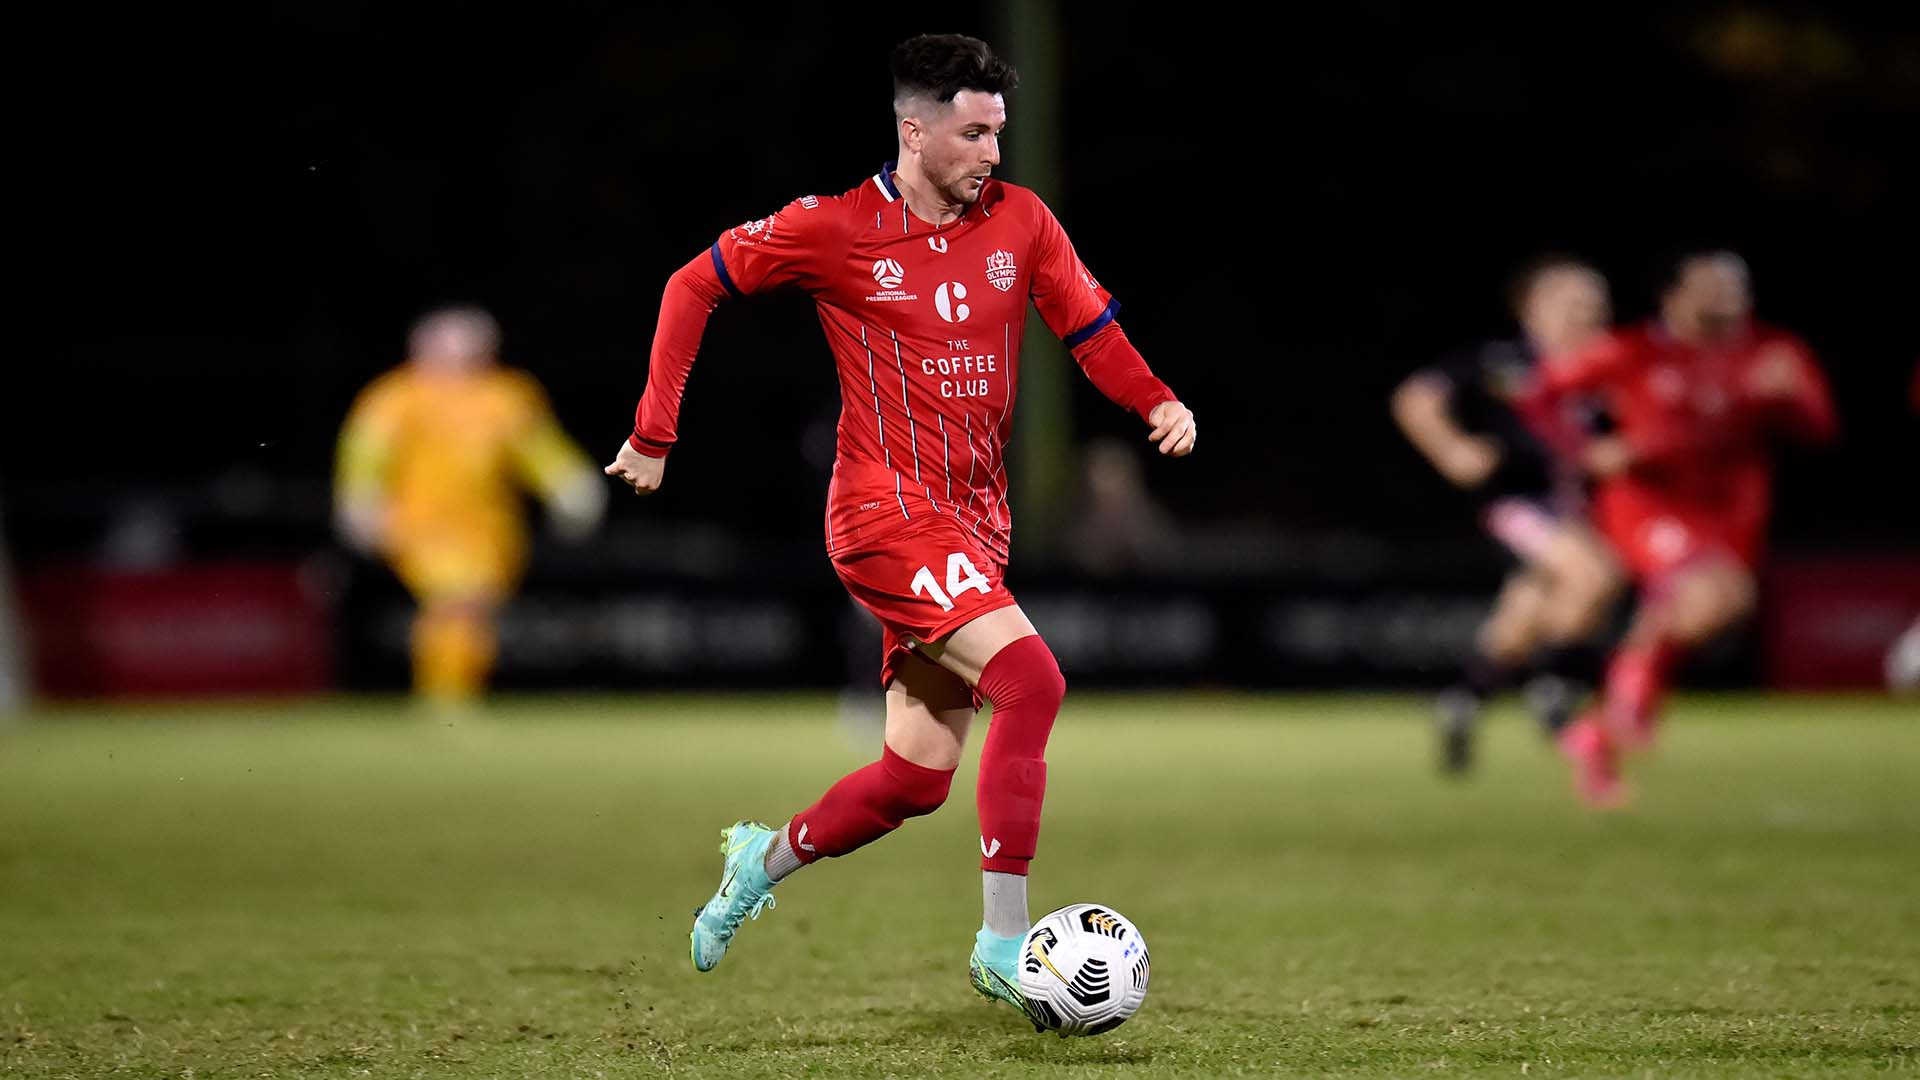 Match Wrap: Sunshine Coast Wanderers 0-1 Olympic FC